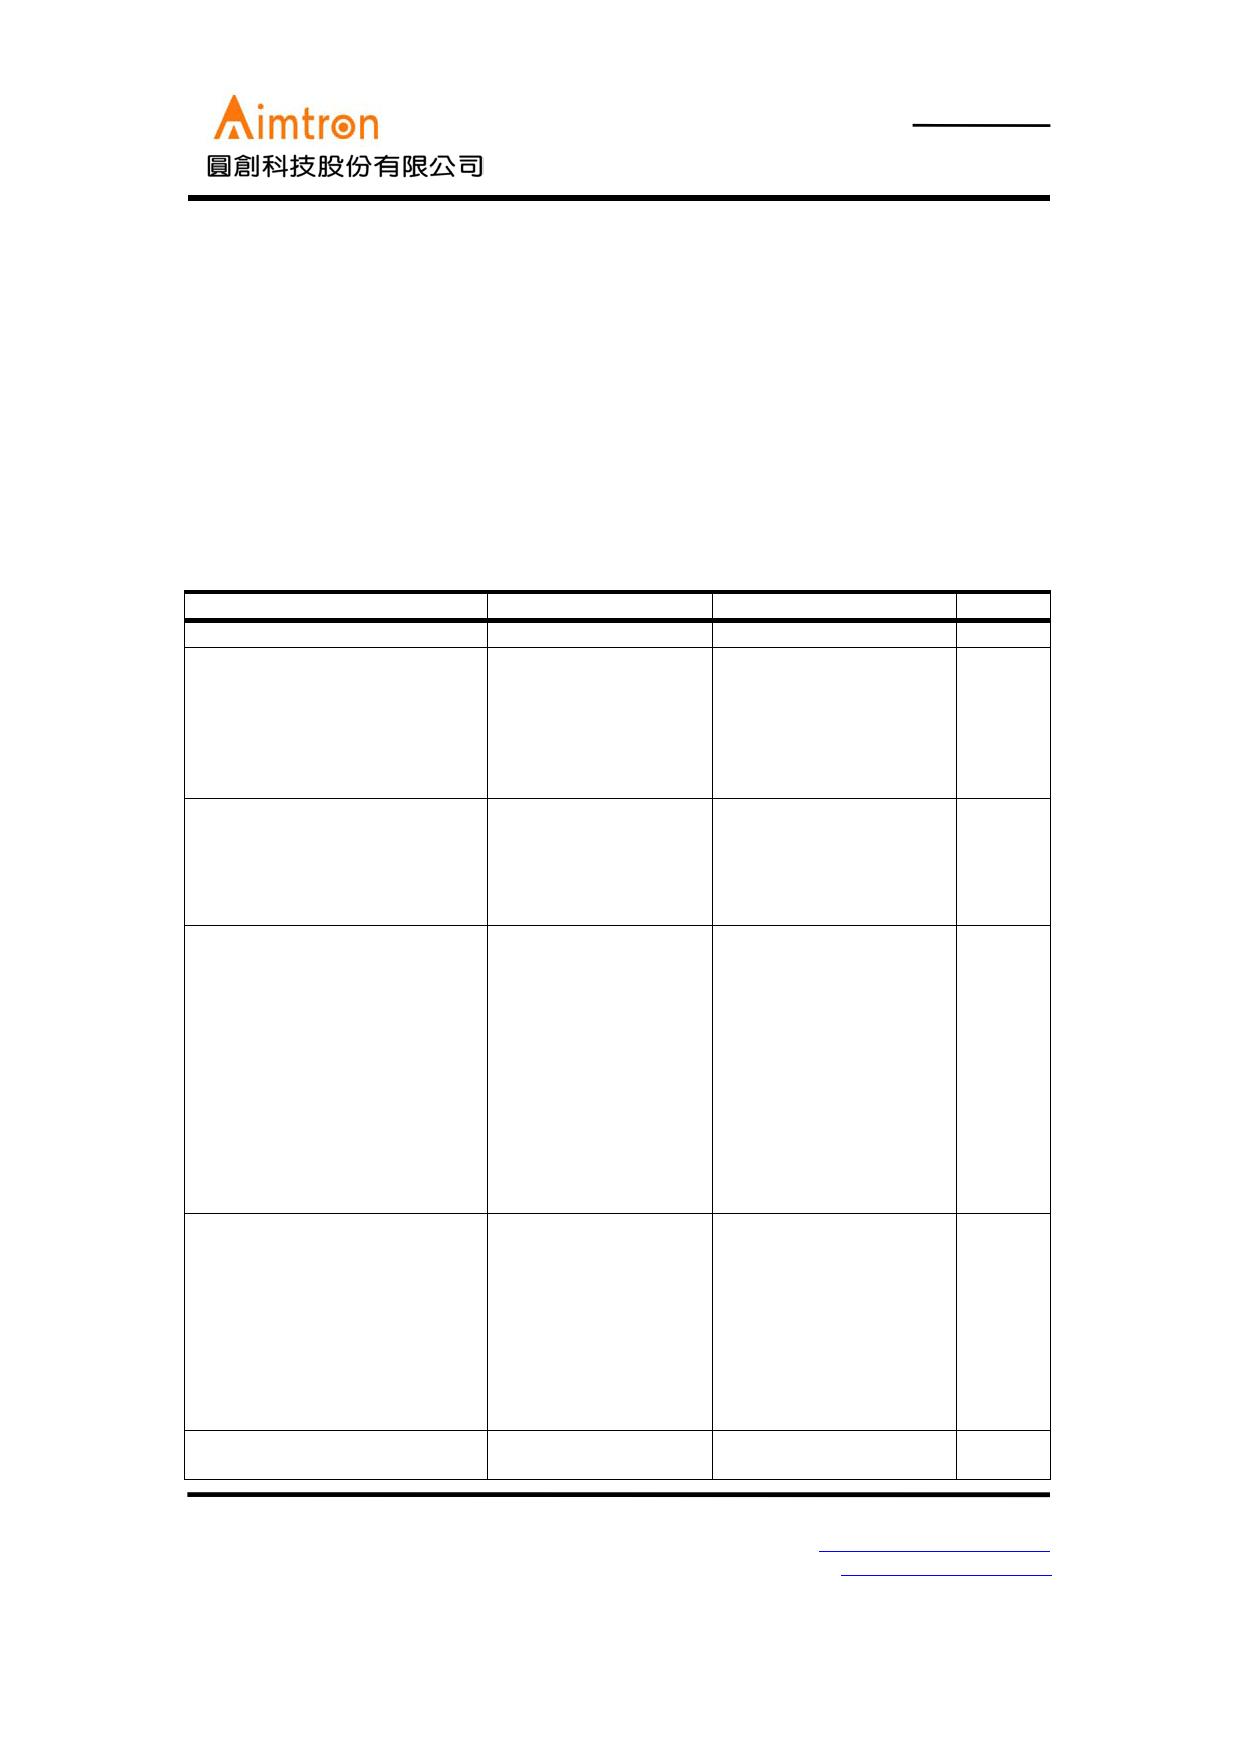 AT1175 pdf, ピン配列